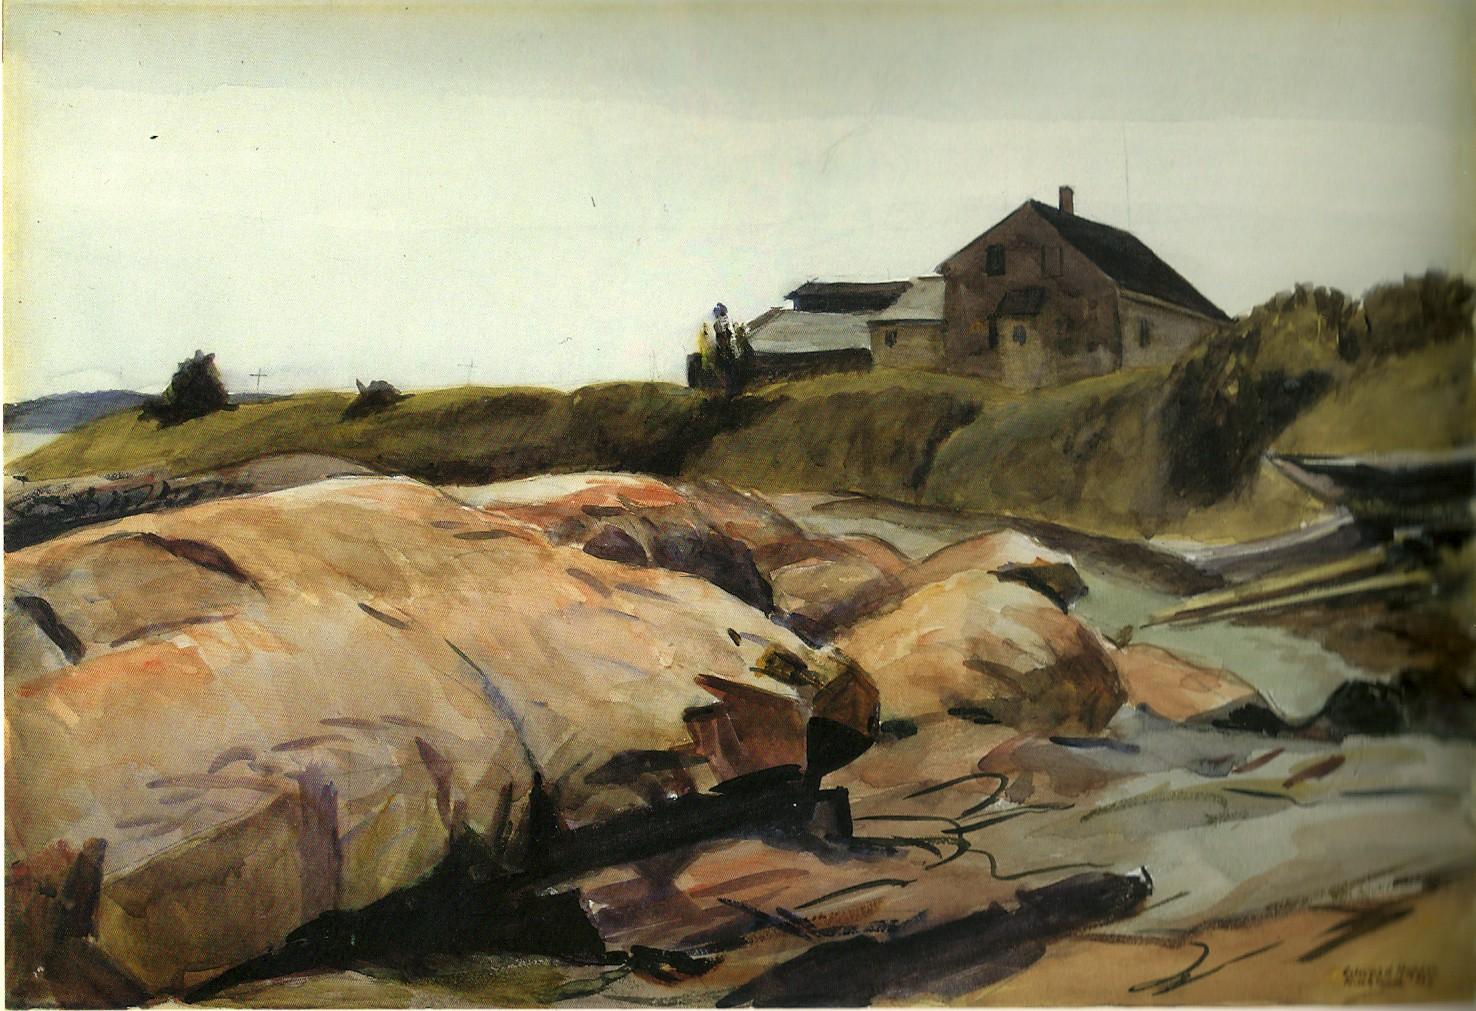 Harbor Shore, Rockland (1926) - Edward Hopper